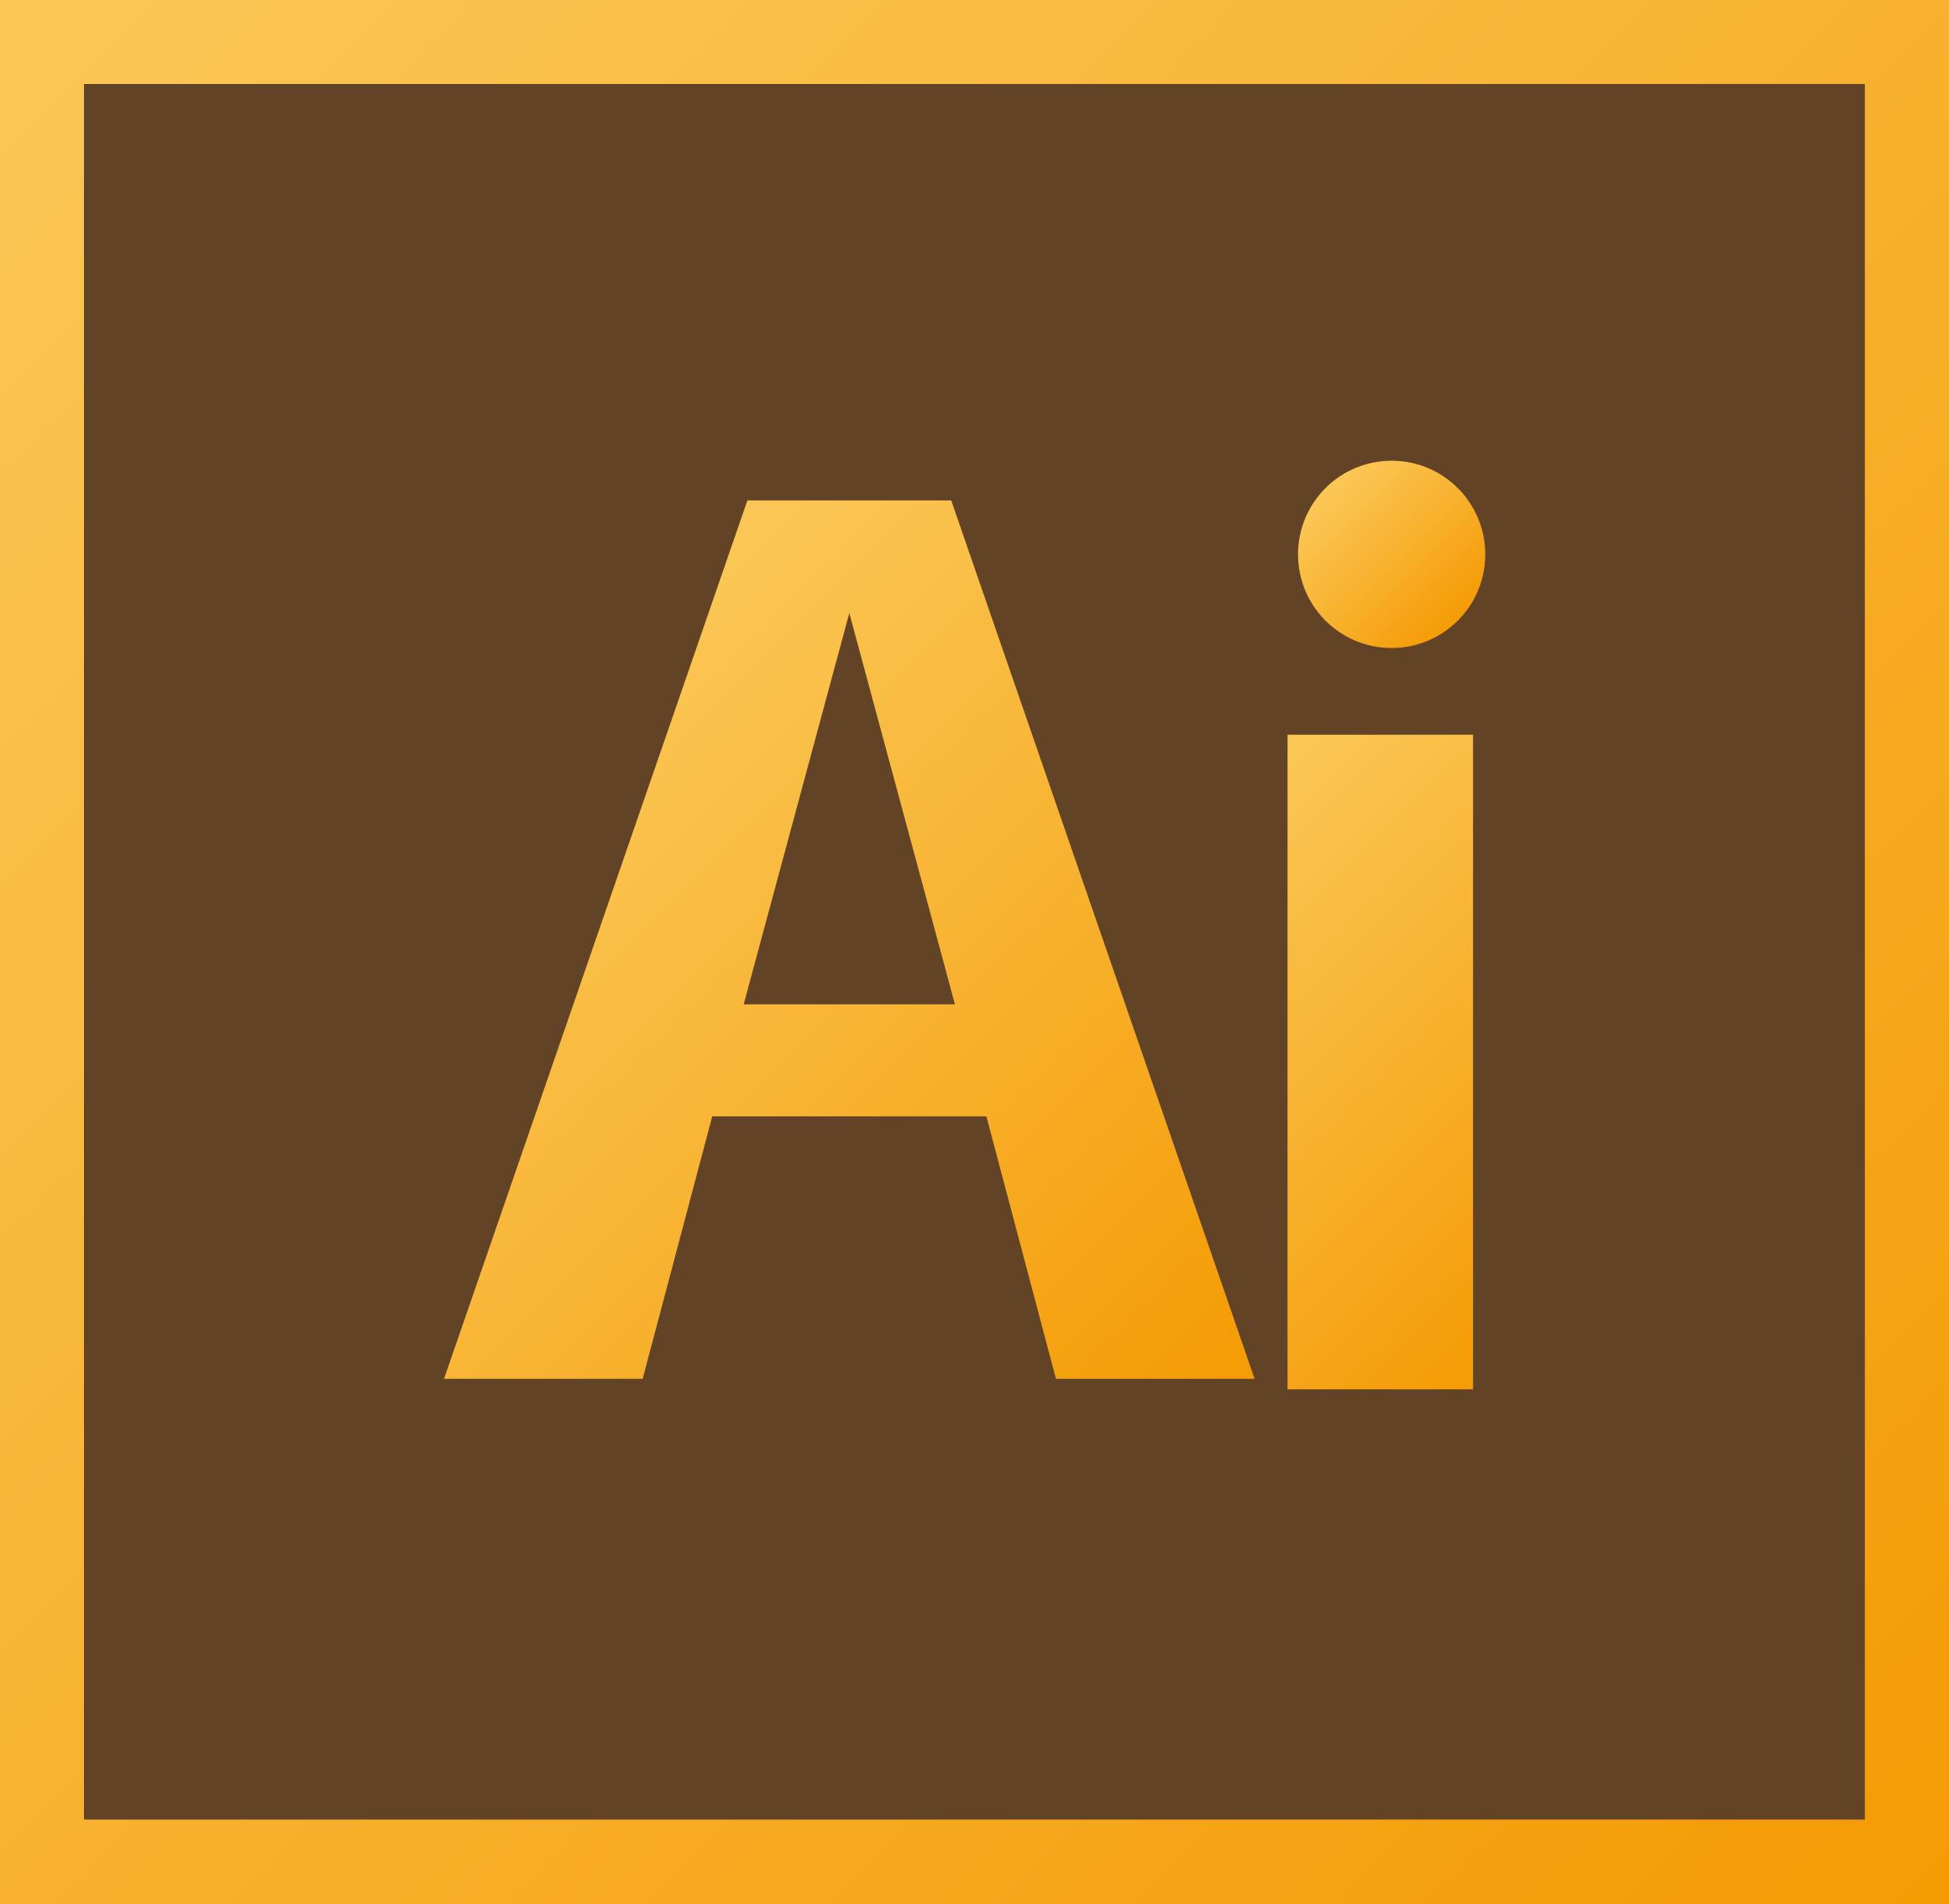 Logo adobe illustrator clipart free library AI Logo [Adobe Illustrator] Vector Icon Template Clipart Free Download free library